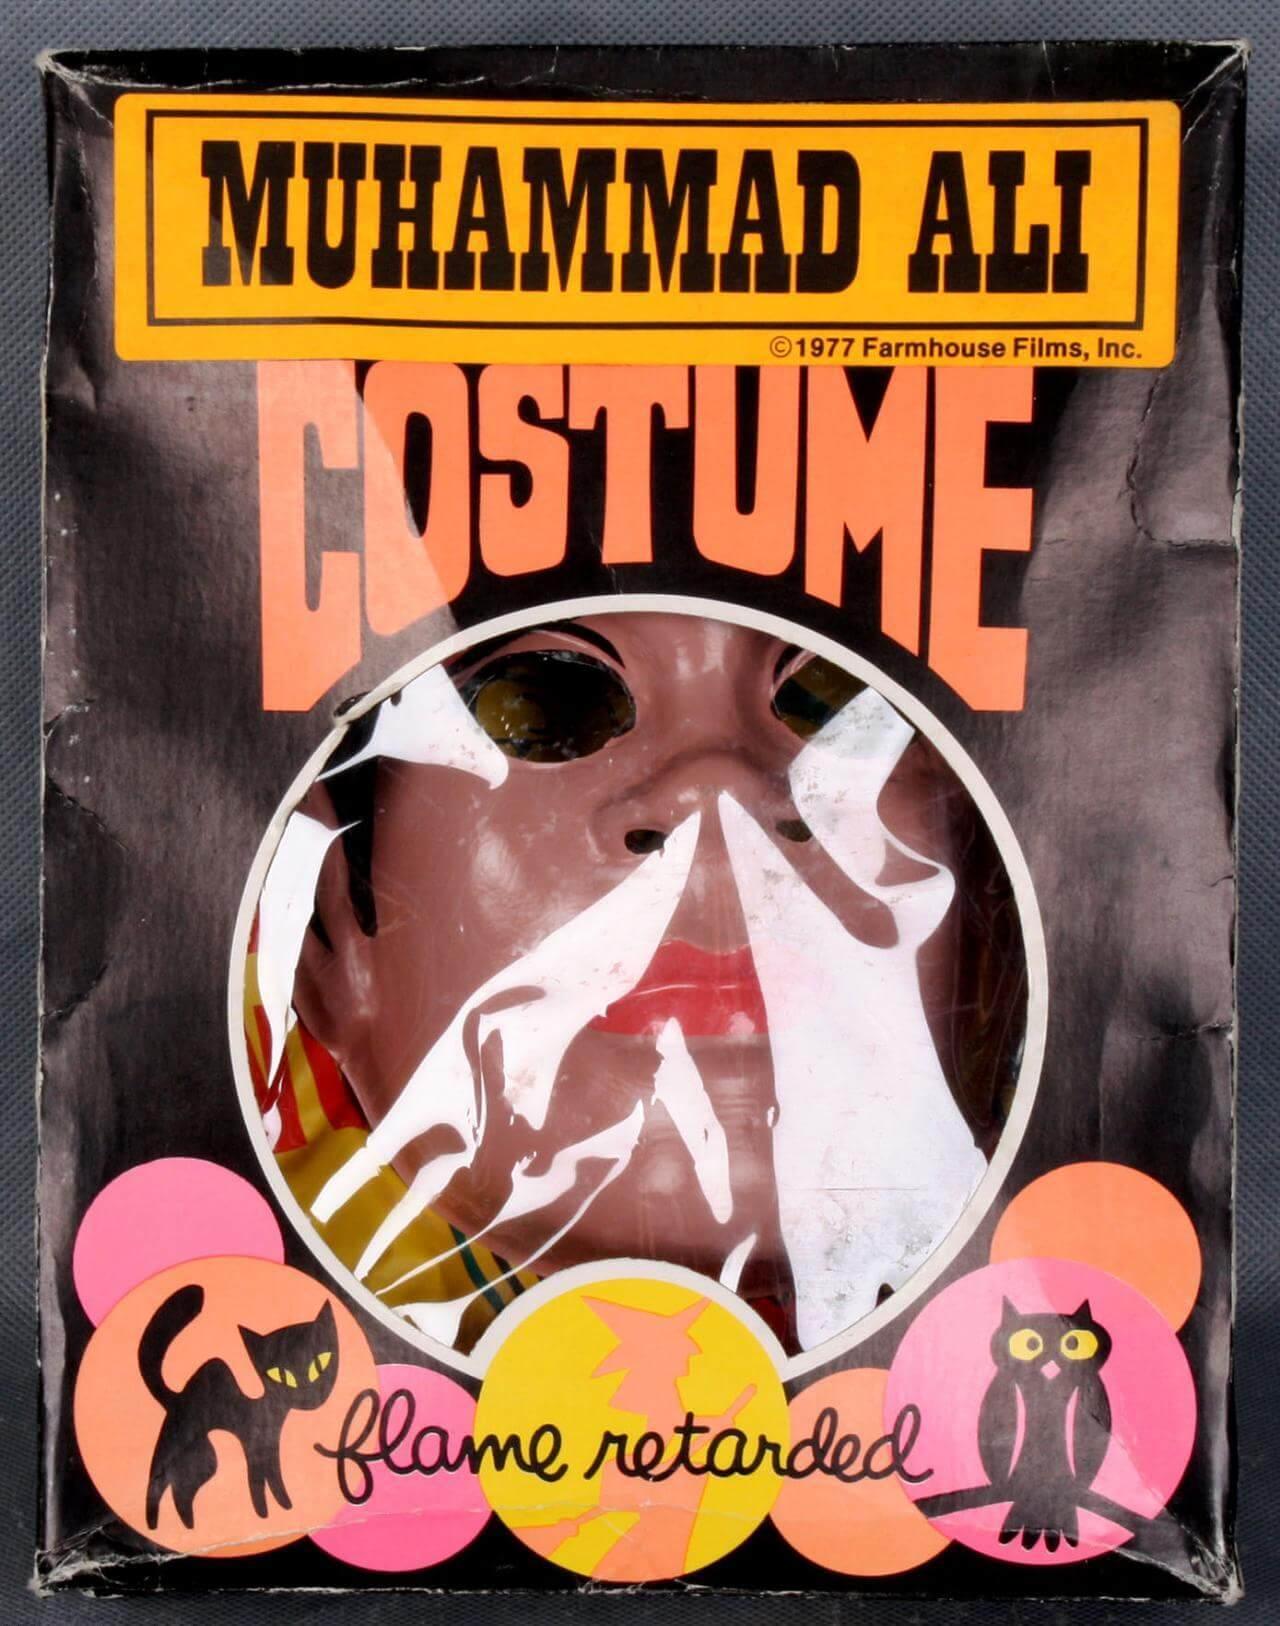 1977 Farm House Films, Inc. - Muhammad Ali Halloween Costume with Box